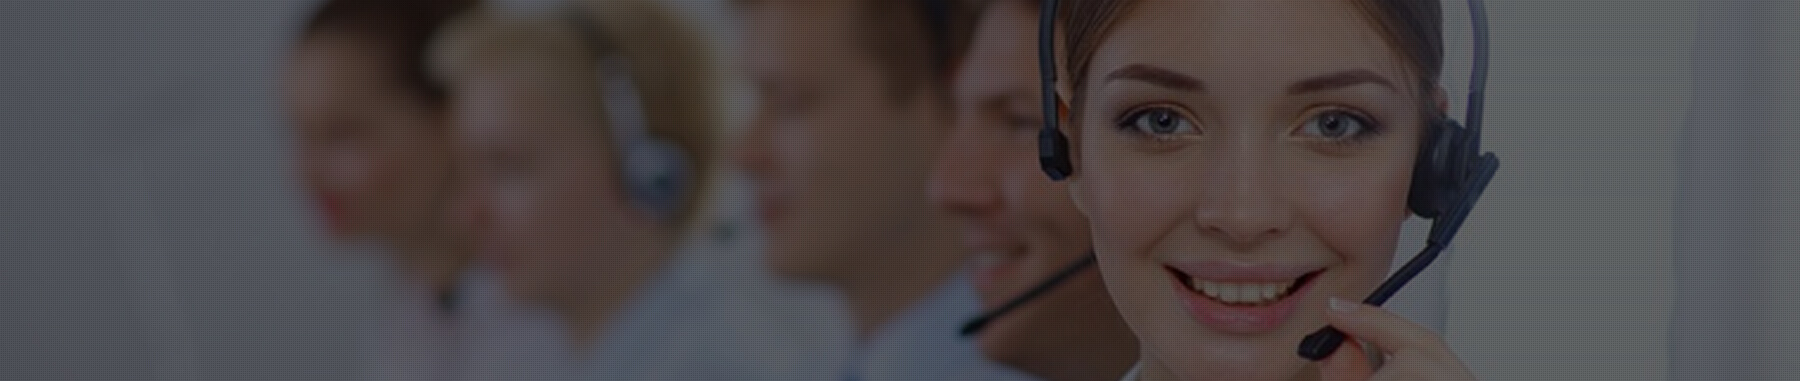 customer-support-backgruond.jpg